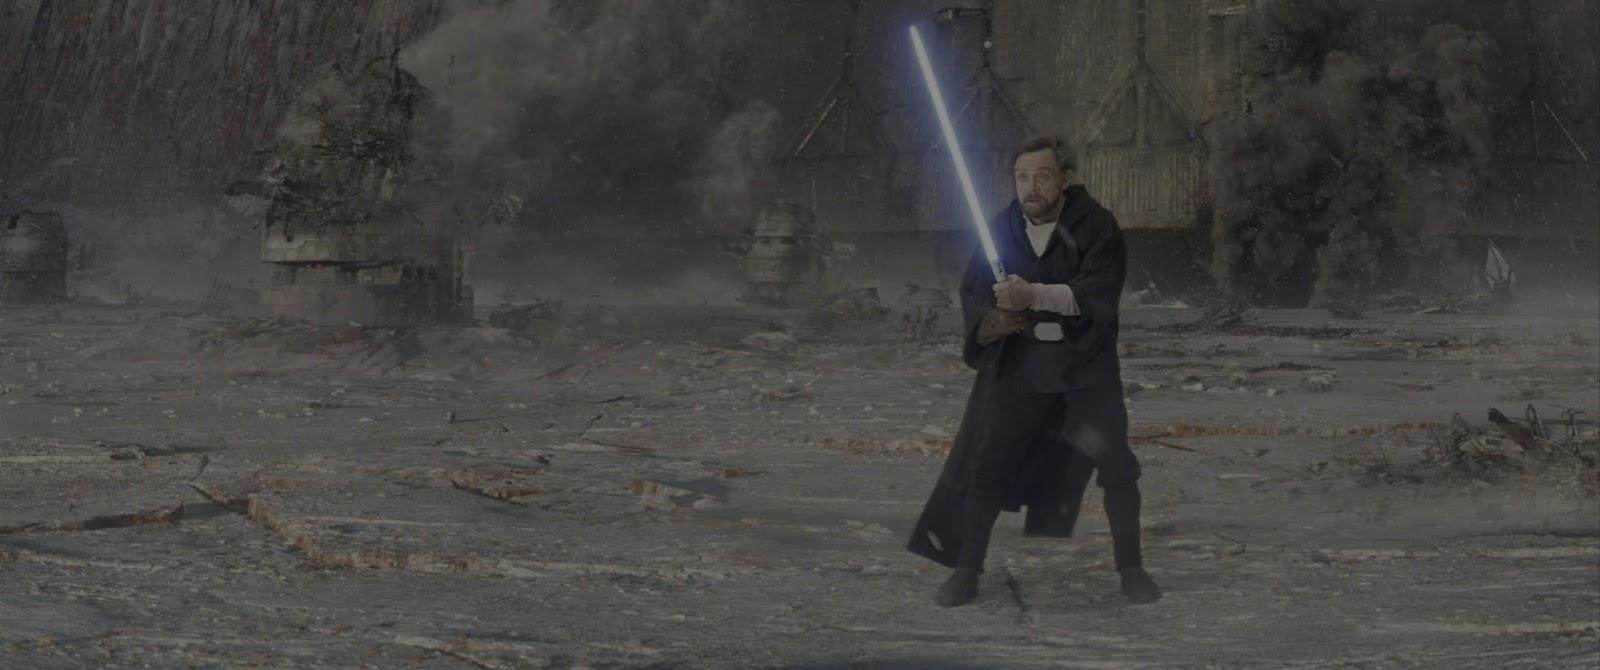 Star+Wars+Episodio+VIII+Los+%C3%9Altimos+Jedi+%282017%29+4K+WEB-DL+HDR+Latino+-+Ingles+-+Descargatepelis.com.mkv_snapshot_02.15.56_%5B2020.01.08_10.17.53%5D.jpg (1600×670)